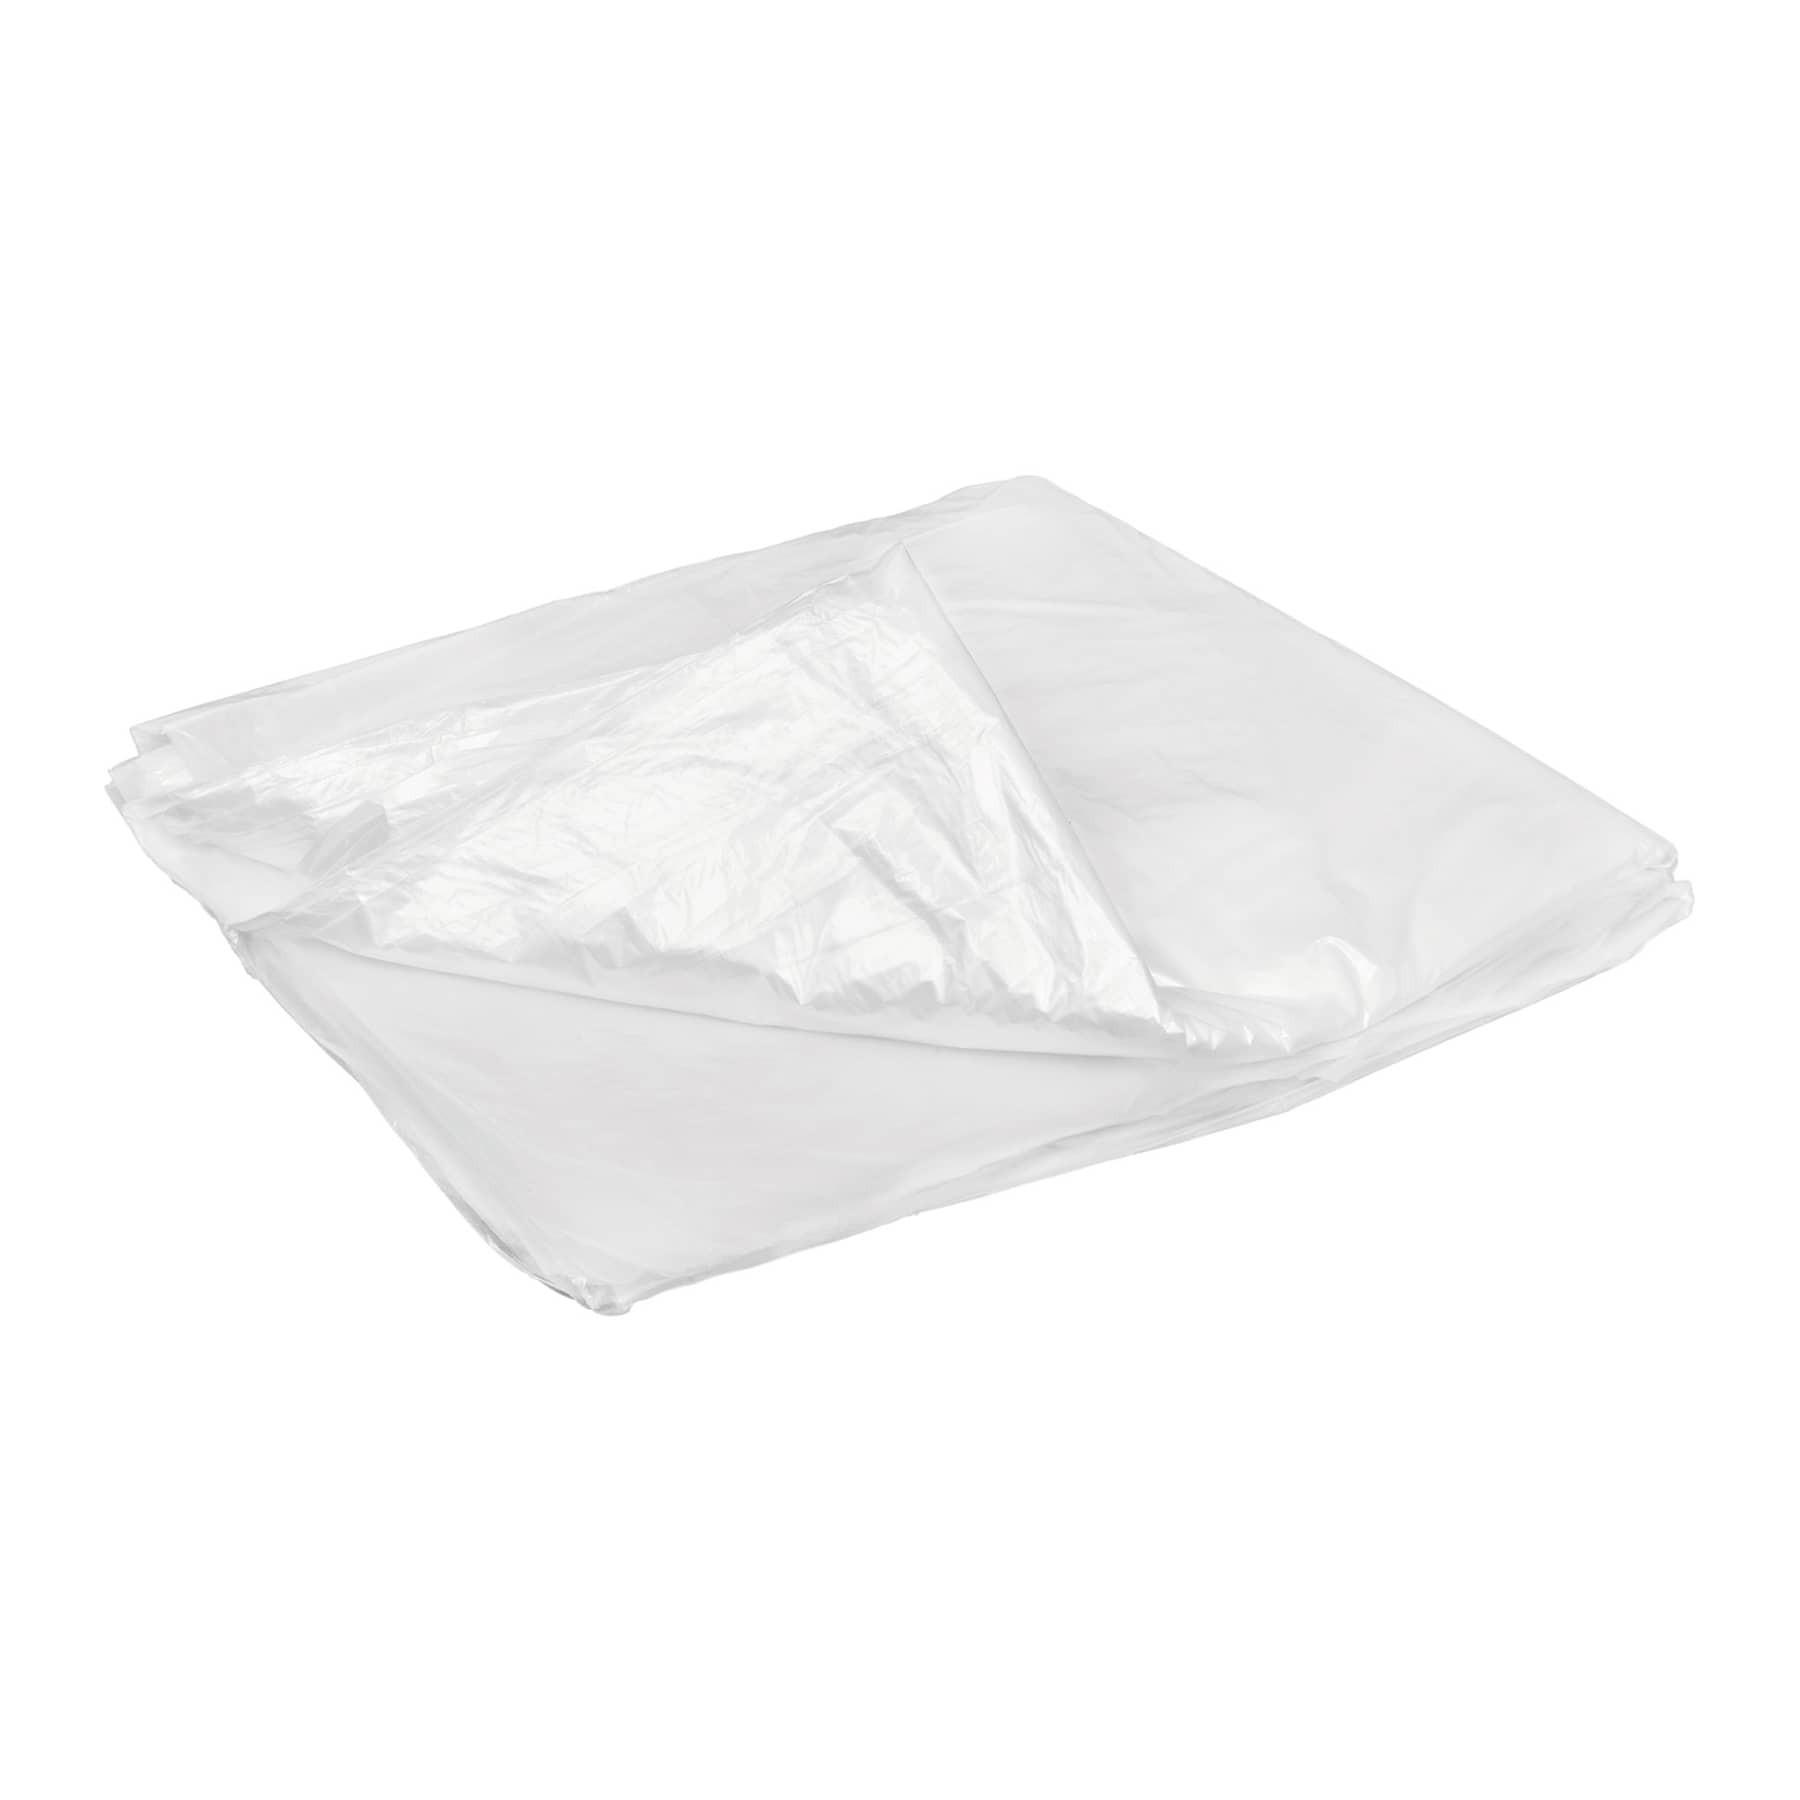 Plastiprotector 15 m2, uso ligero